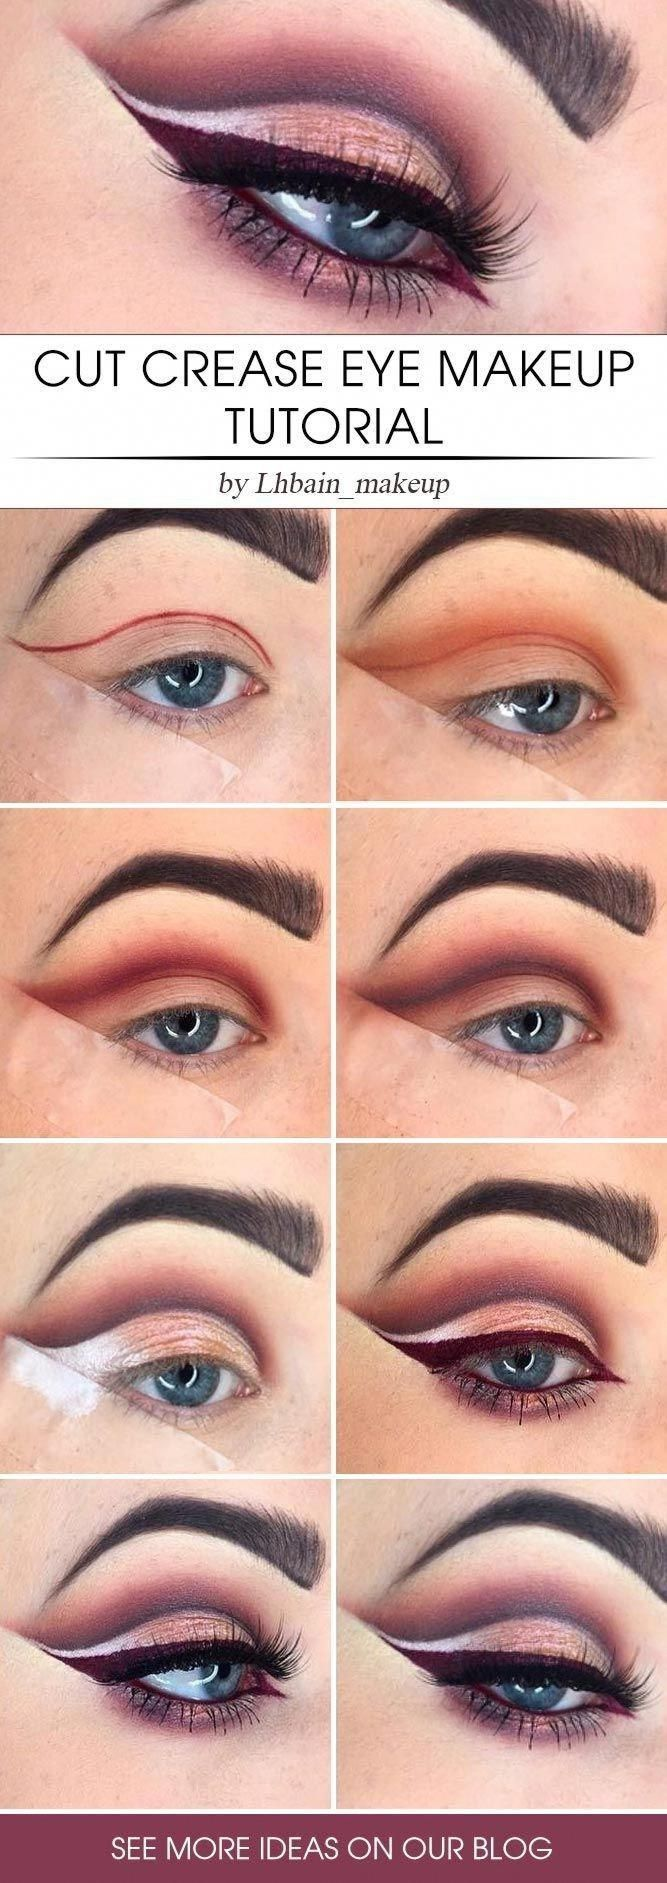 Nude eyemakeup steps — 7